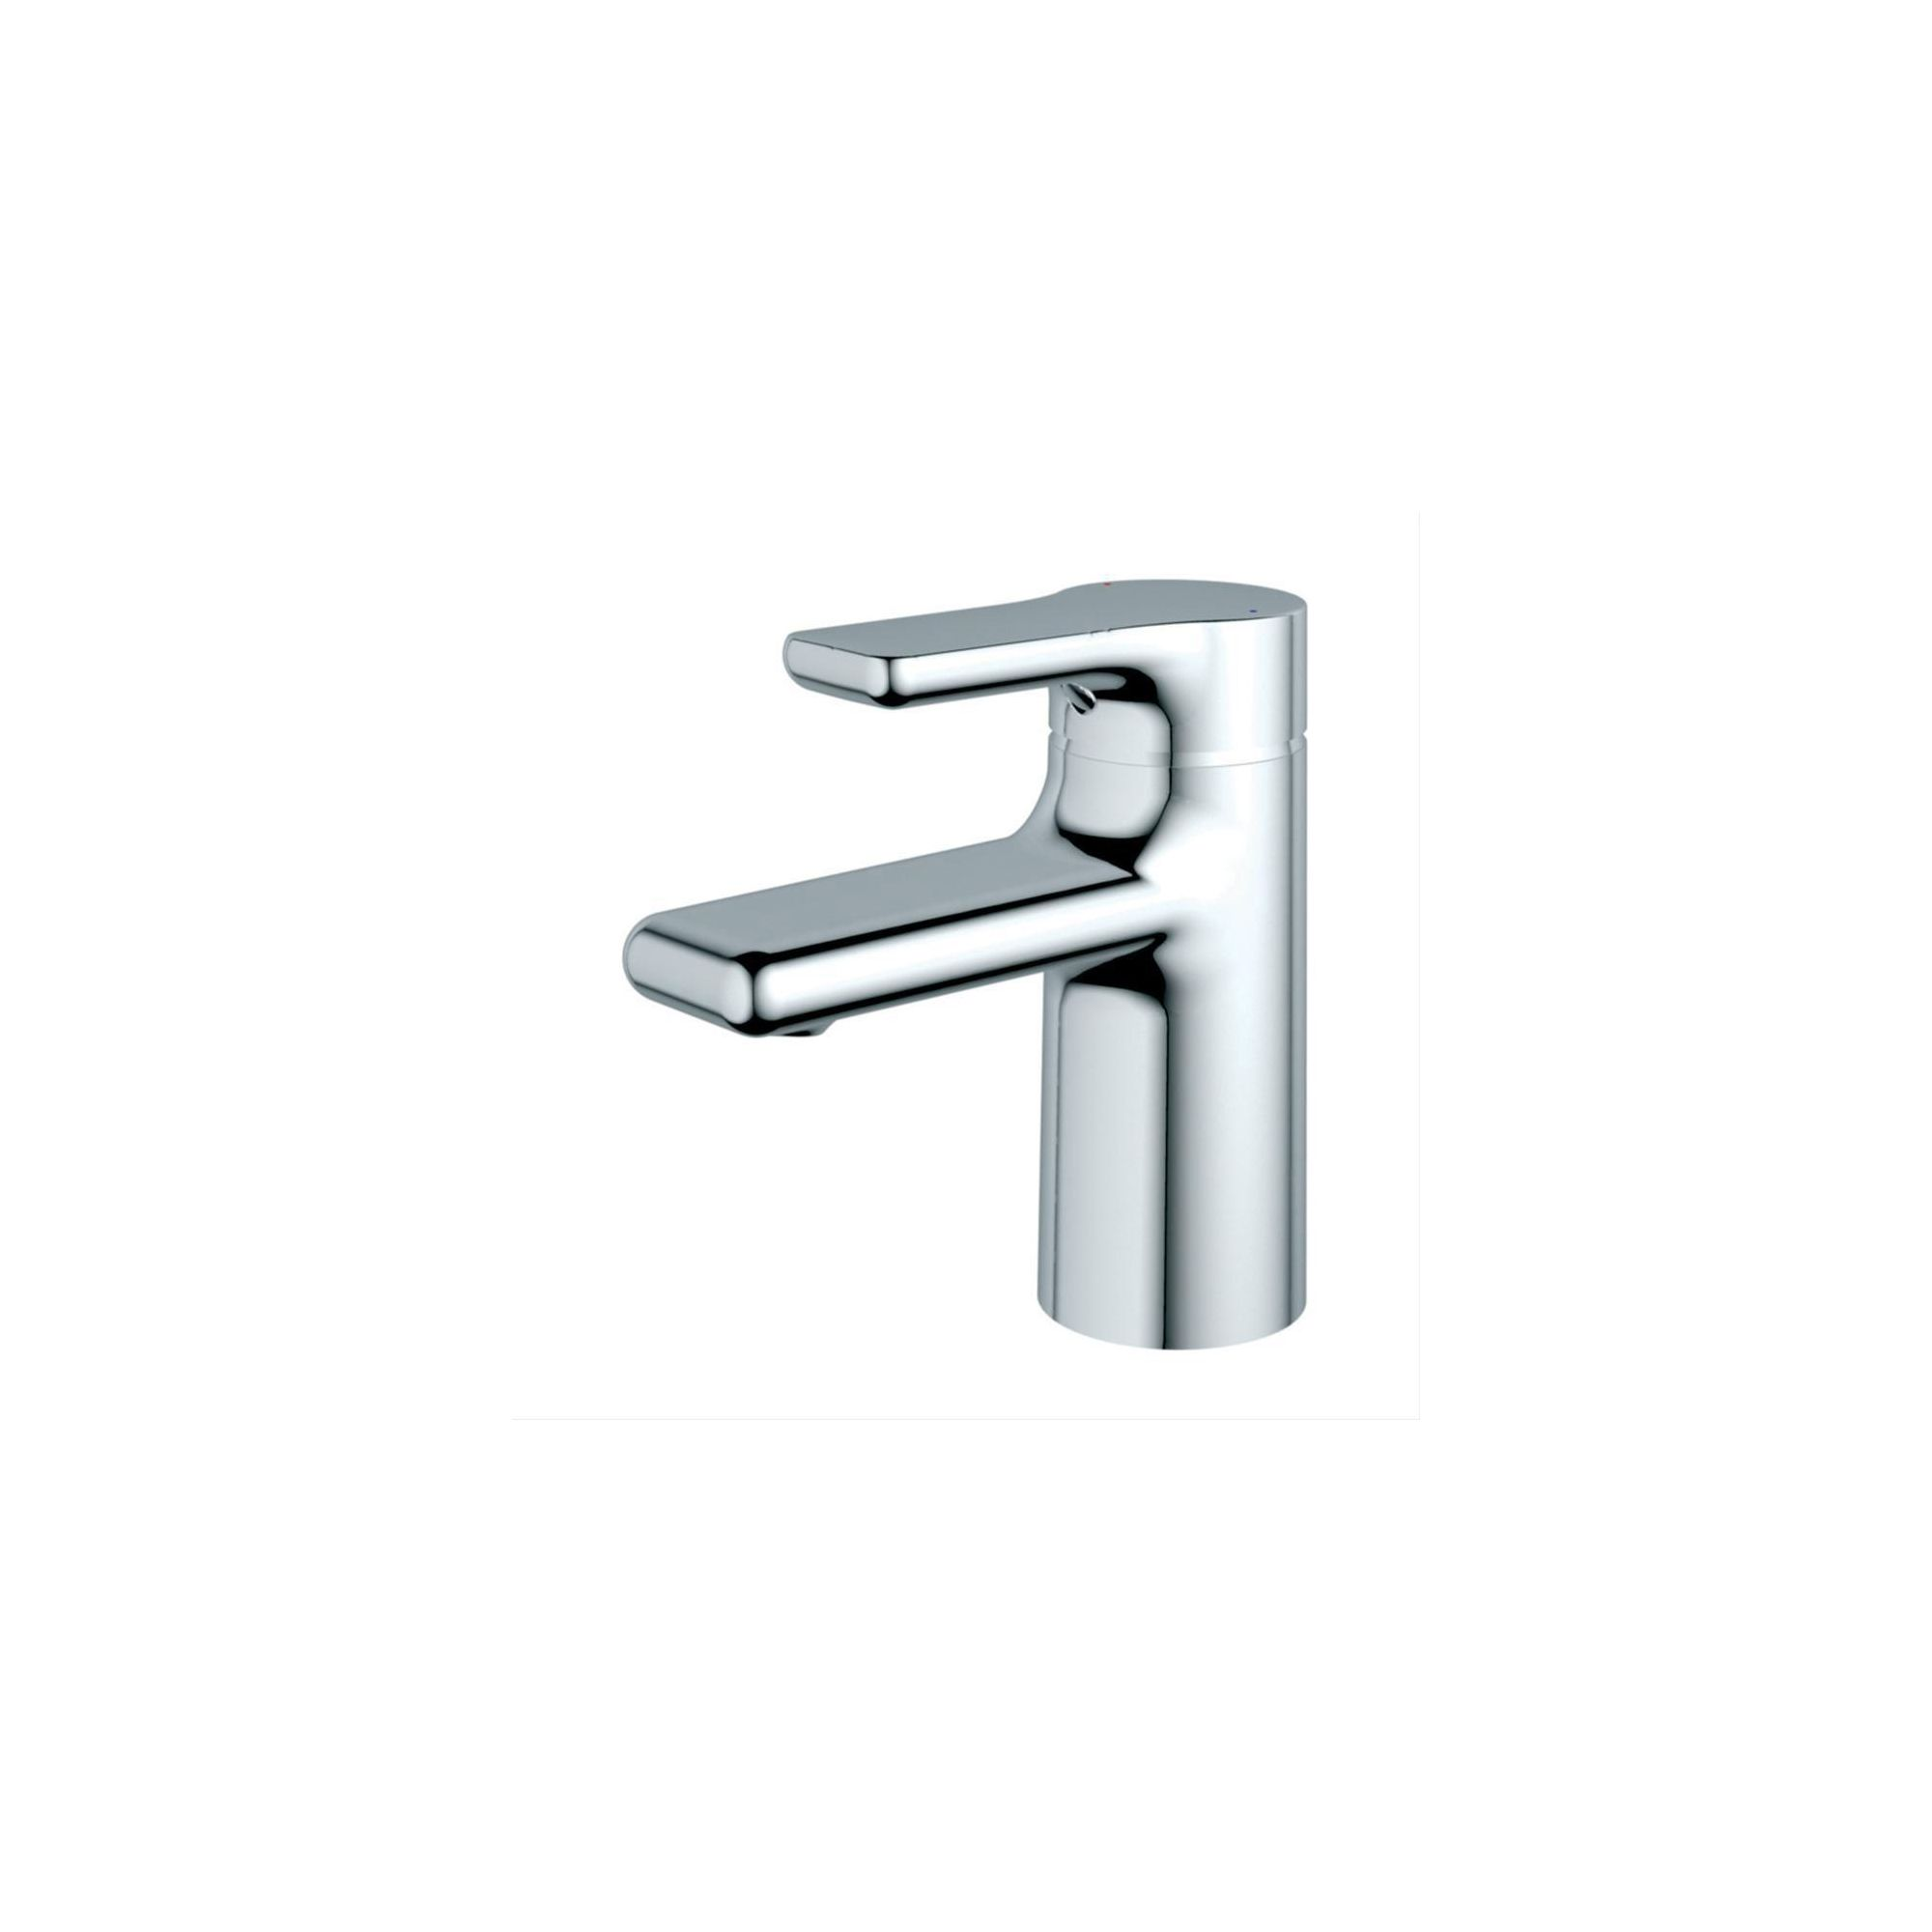 Ideal Standard Attitude Mono Bath Filler Tap Chrome at Tesco Direct